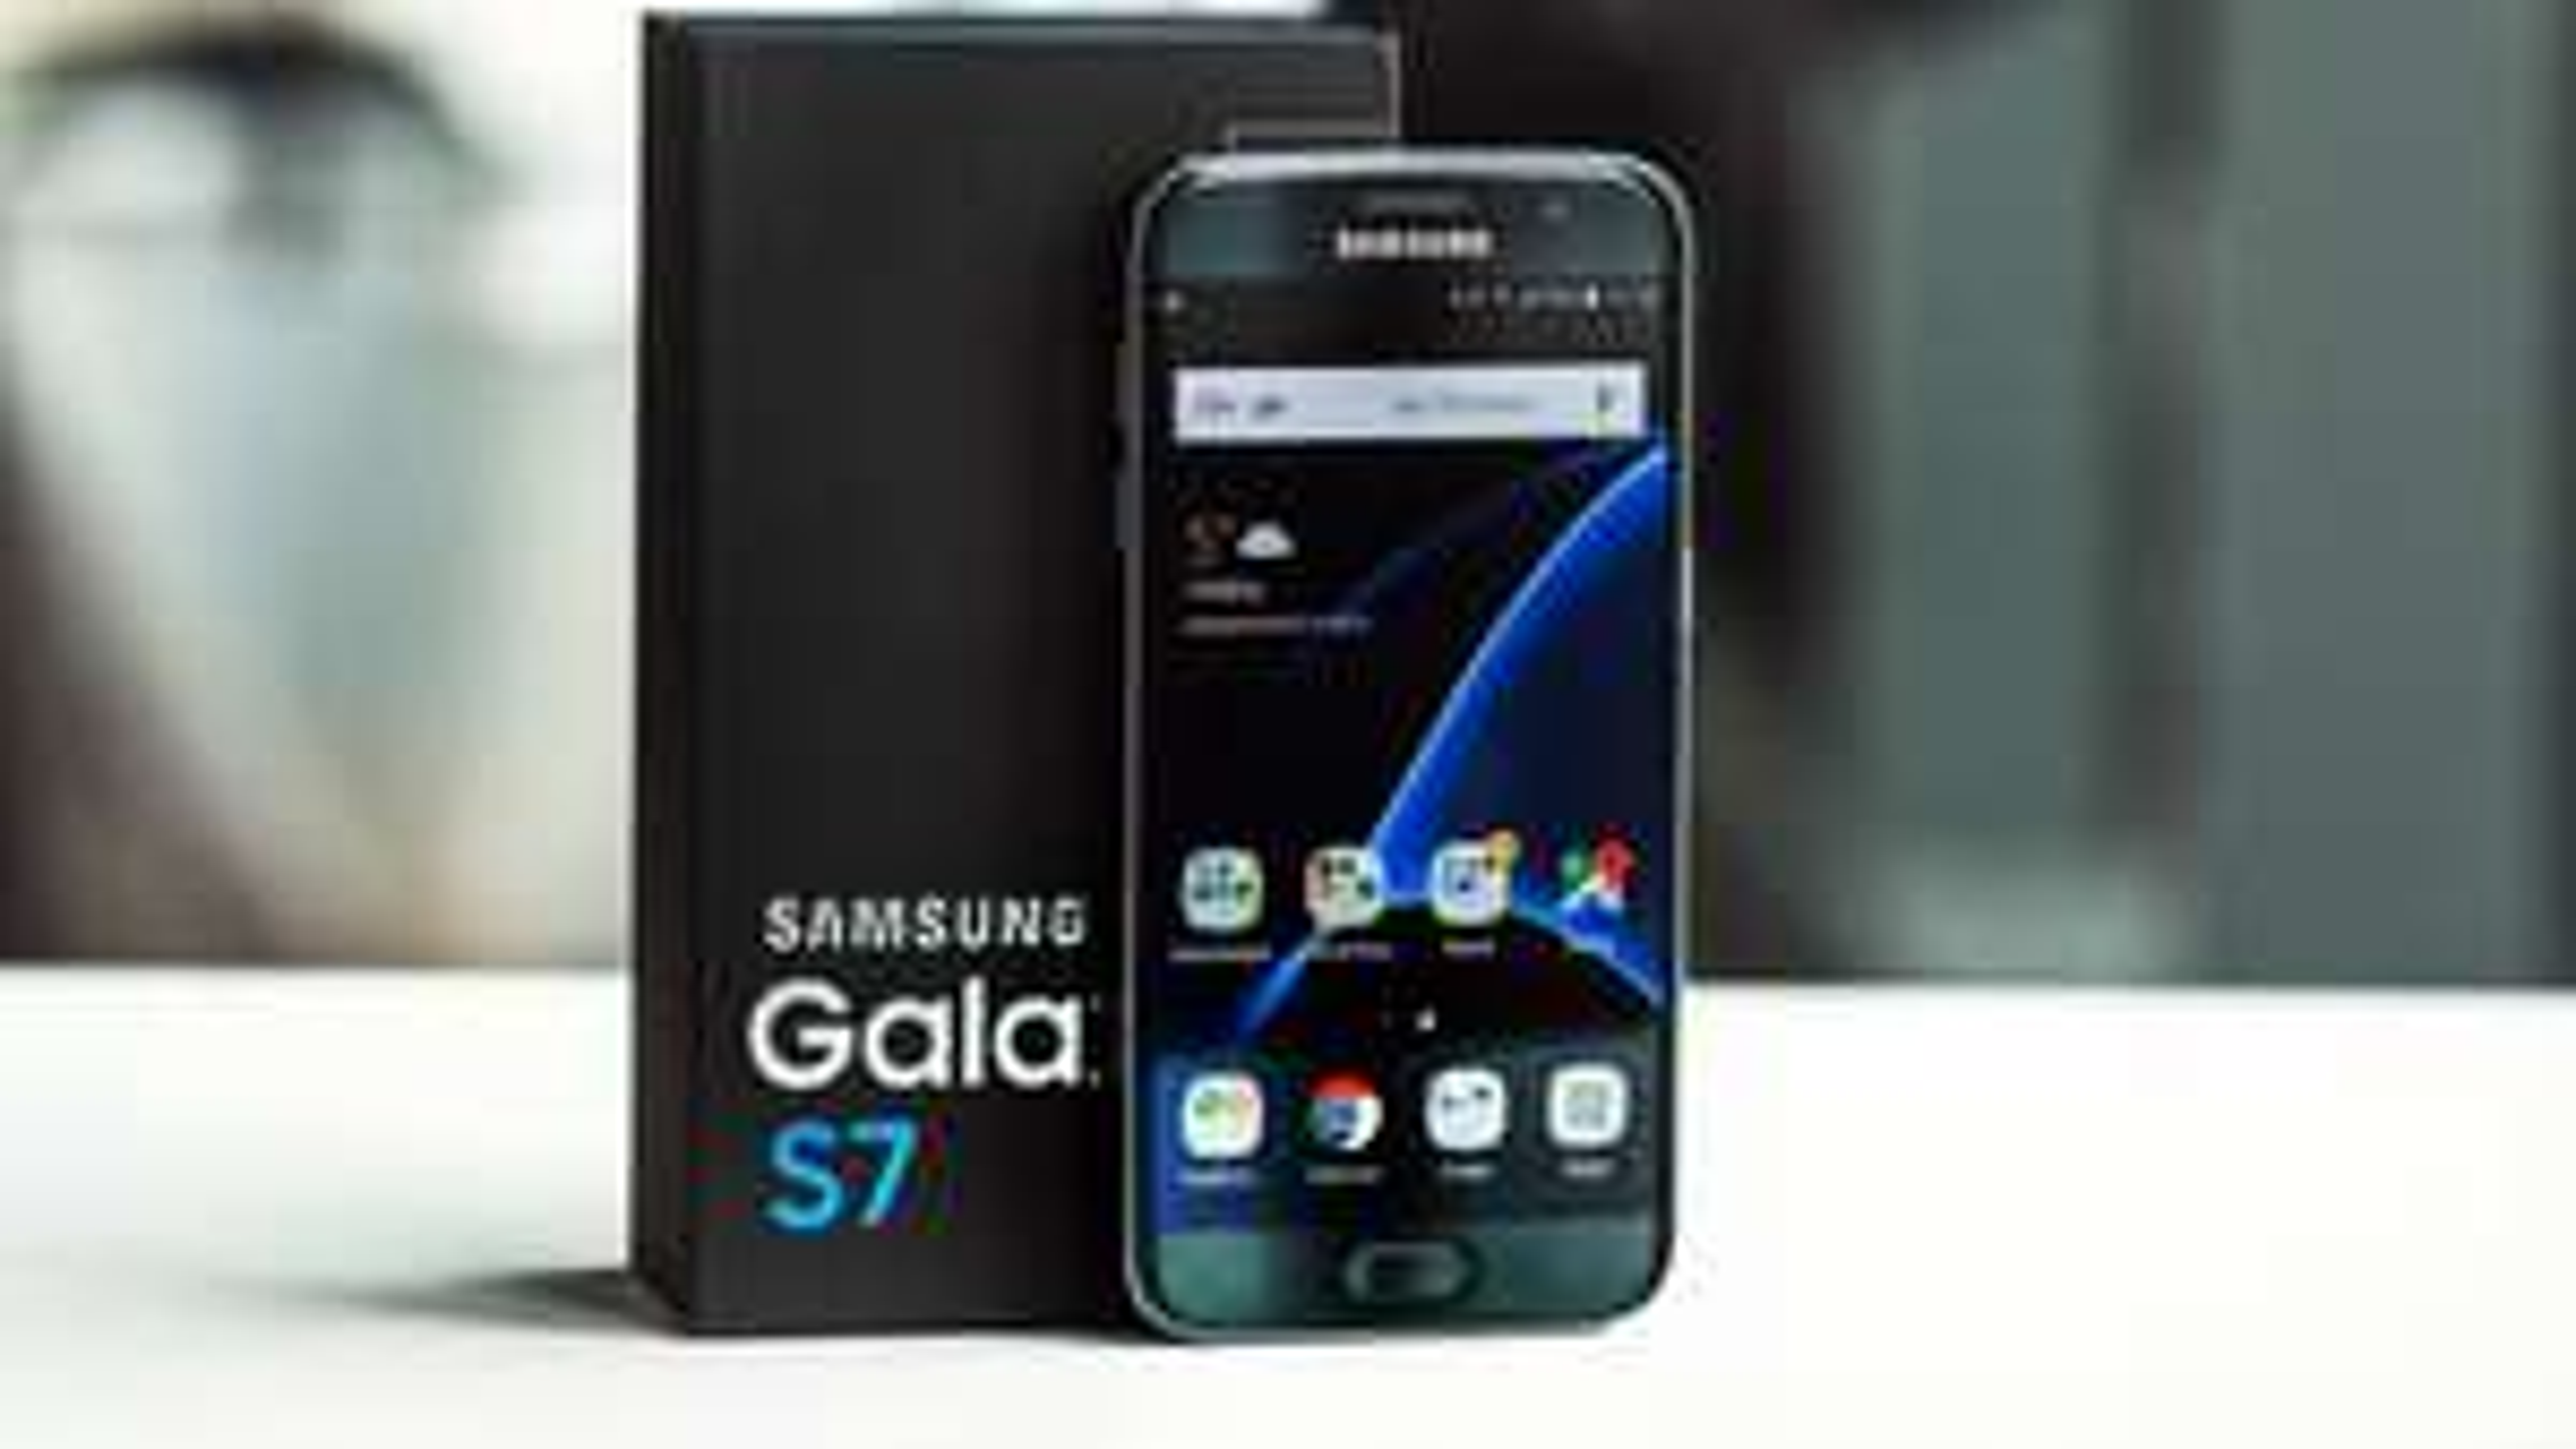 Samsung Galaxy S7 + SAMSUNG GEAR 360 +  Flat Allnet Comfort Vodafone (1GB) 20Euro /Monat